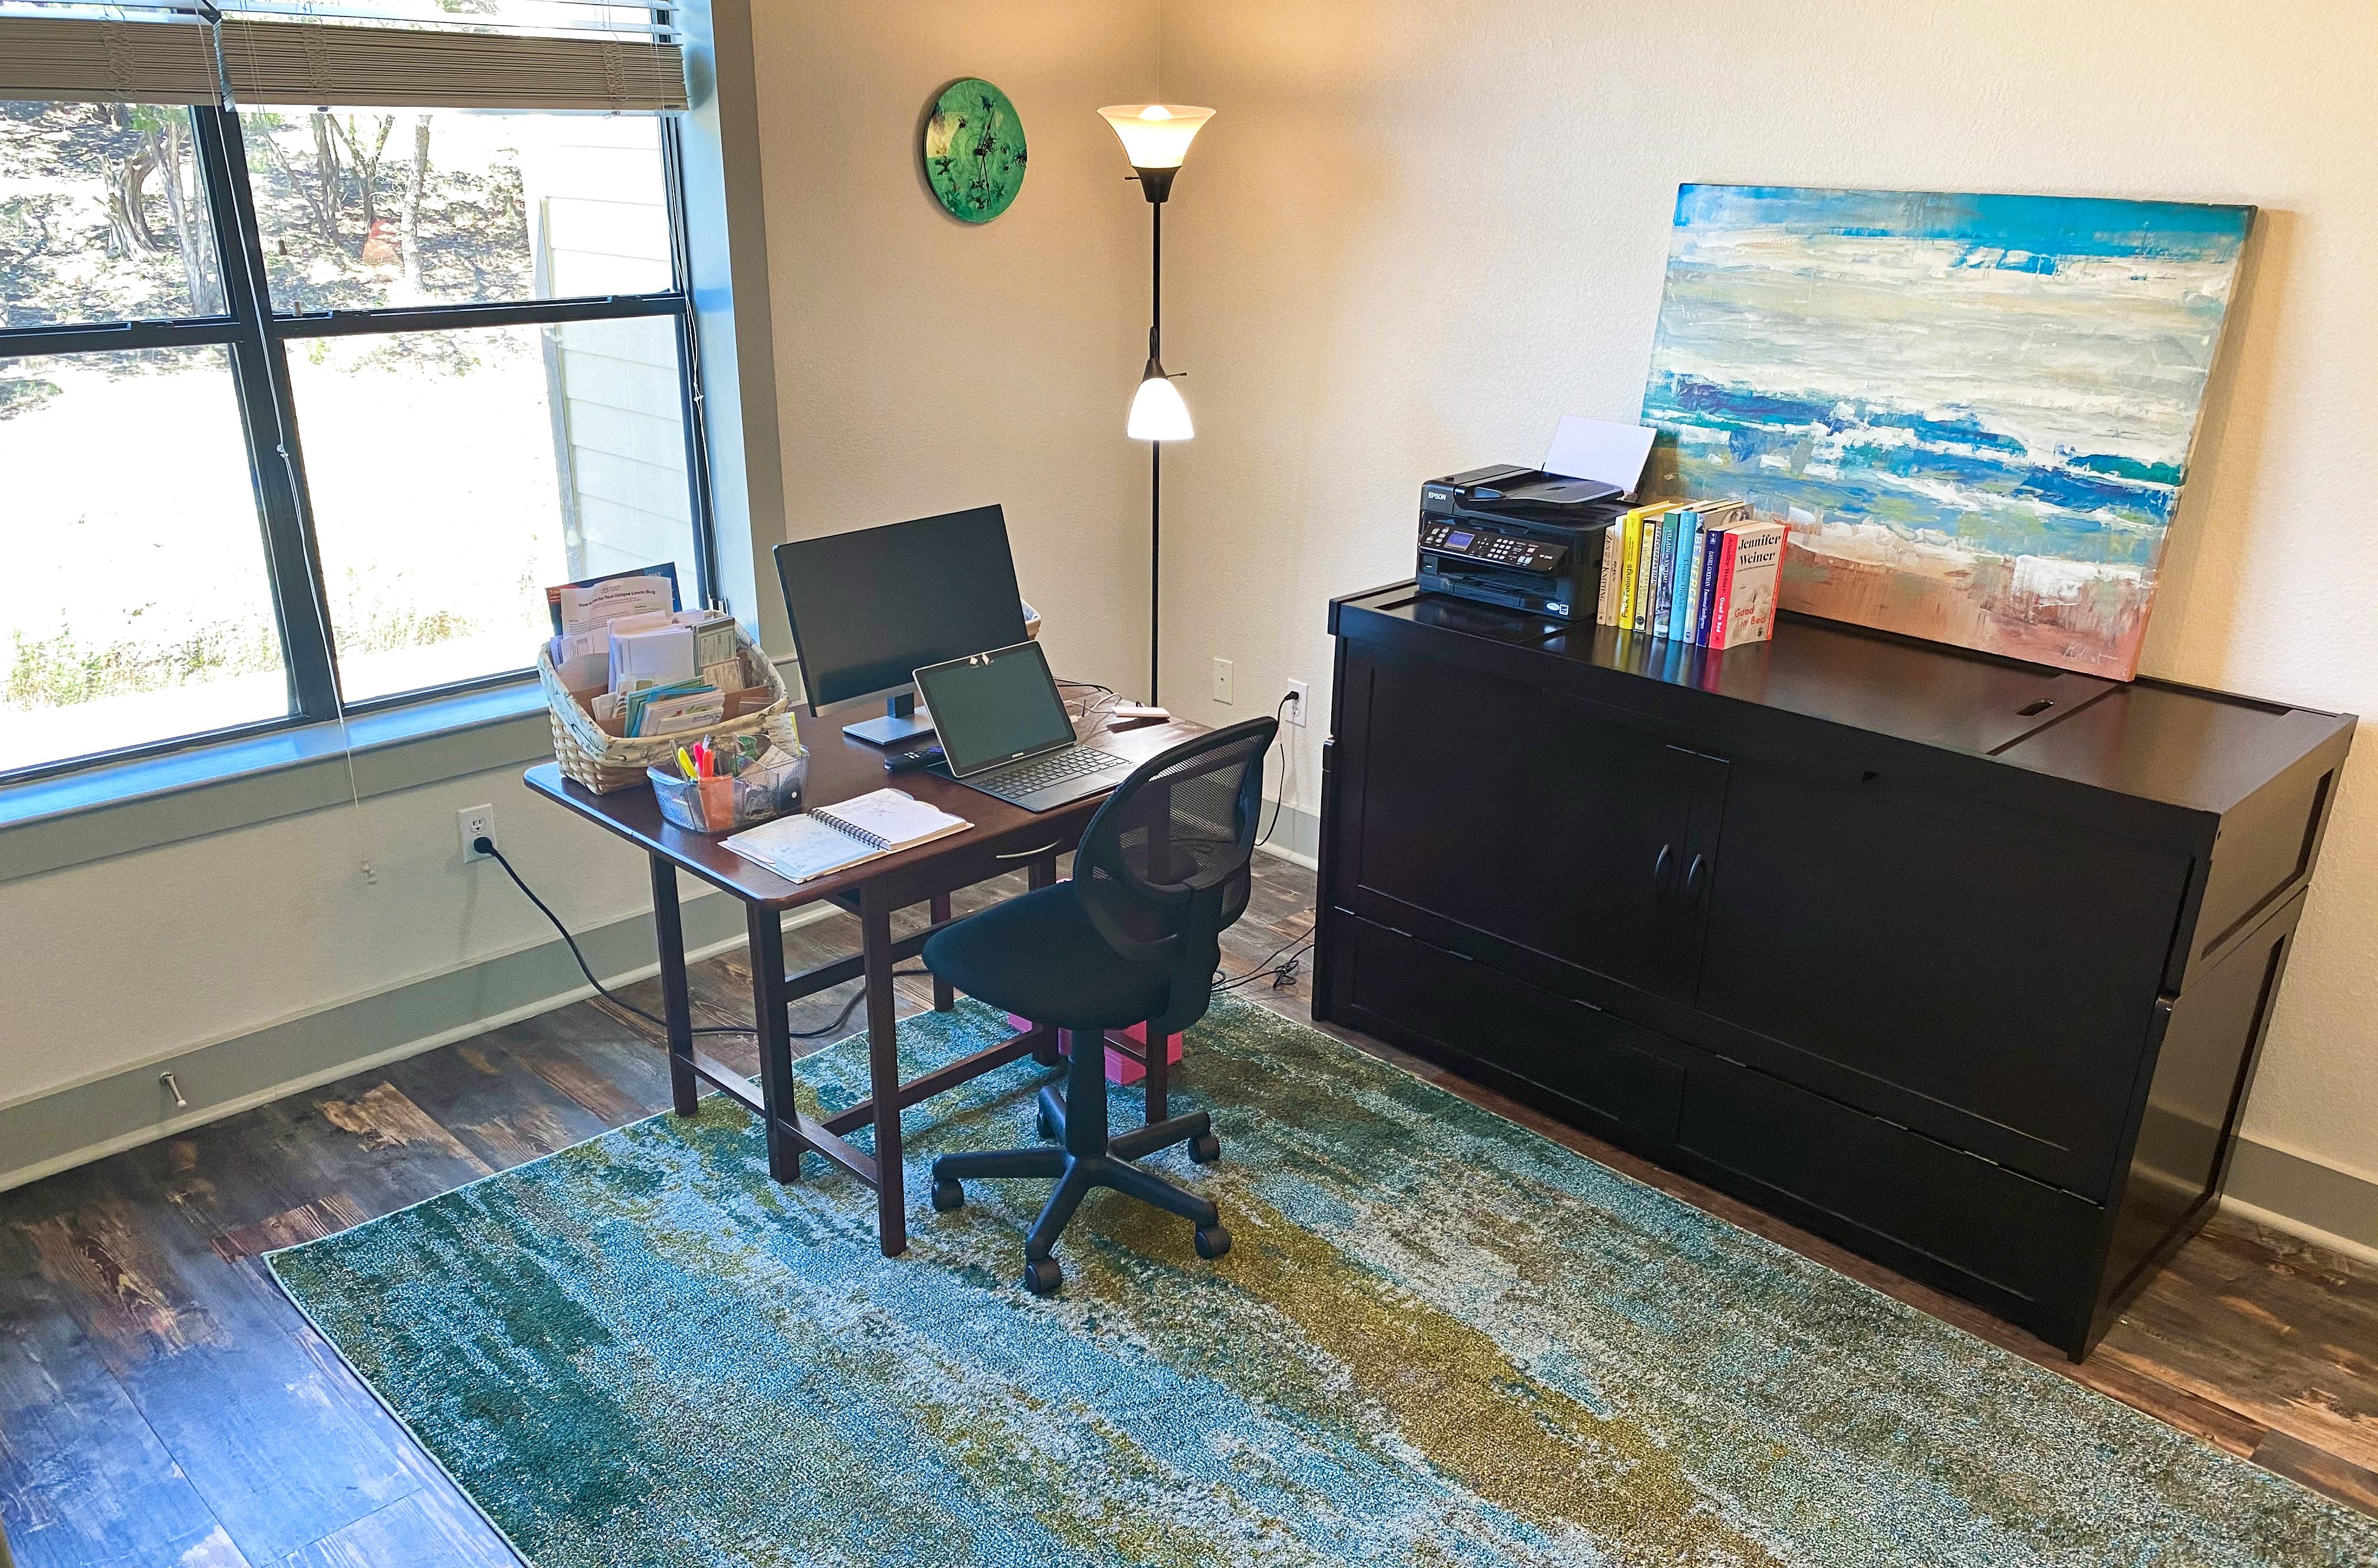 art-office as office